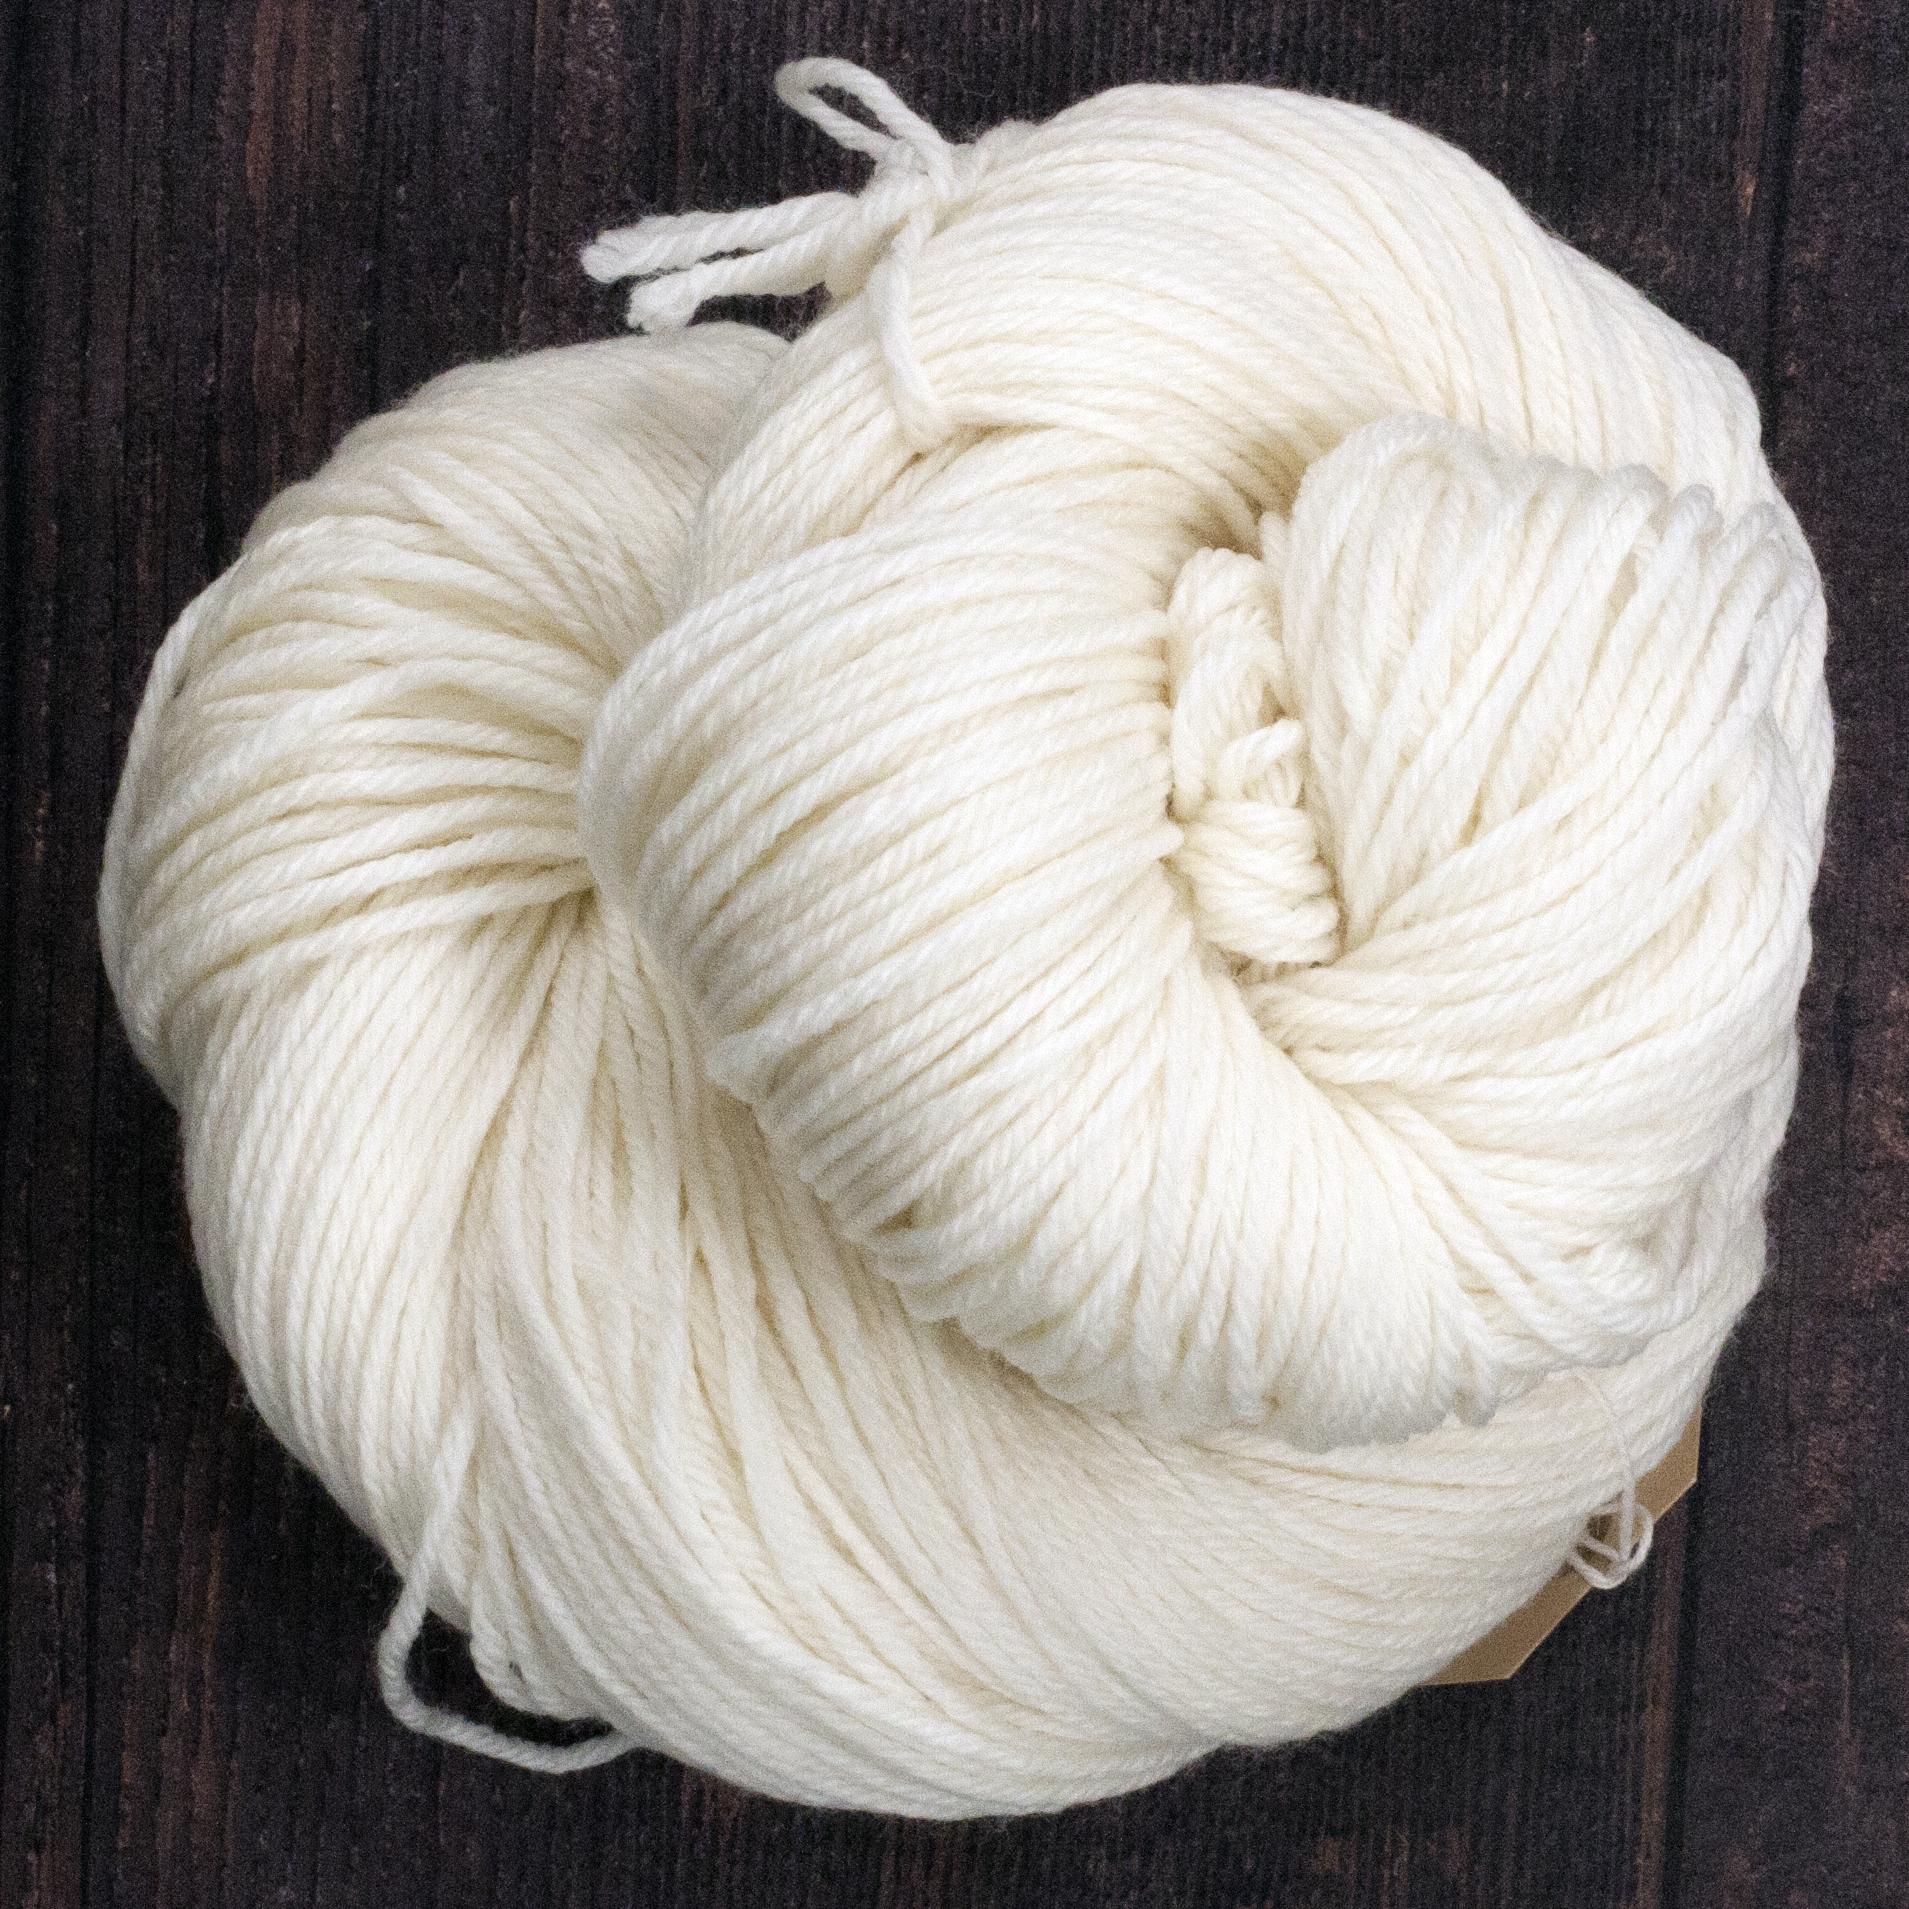 Type 49204C   Ultra DK 50s 100% Superwash Merino Wool  50g Hanks 112m per 50g (225m per 100g) 4/9nm